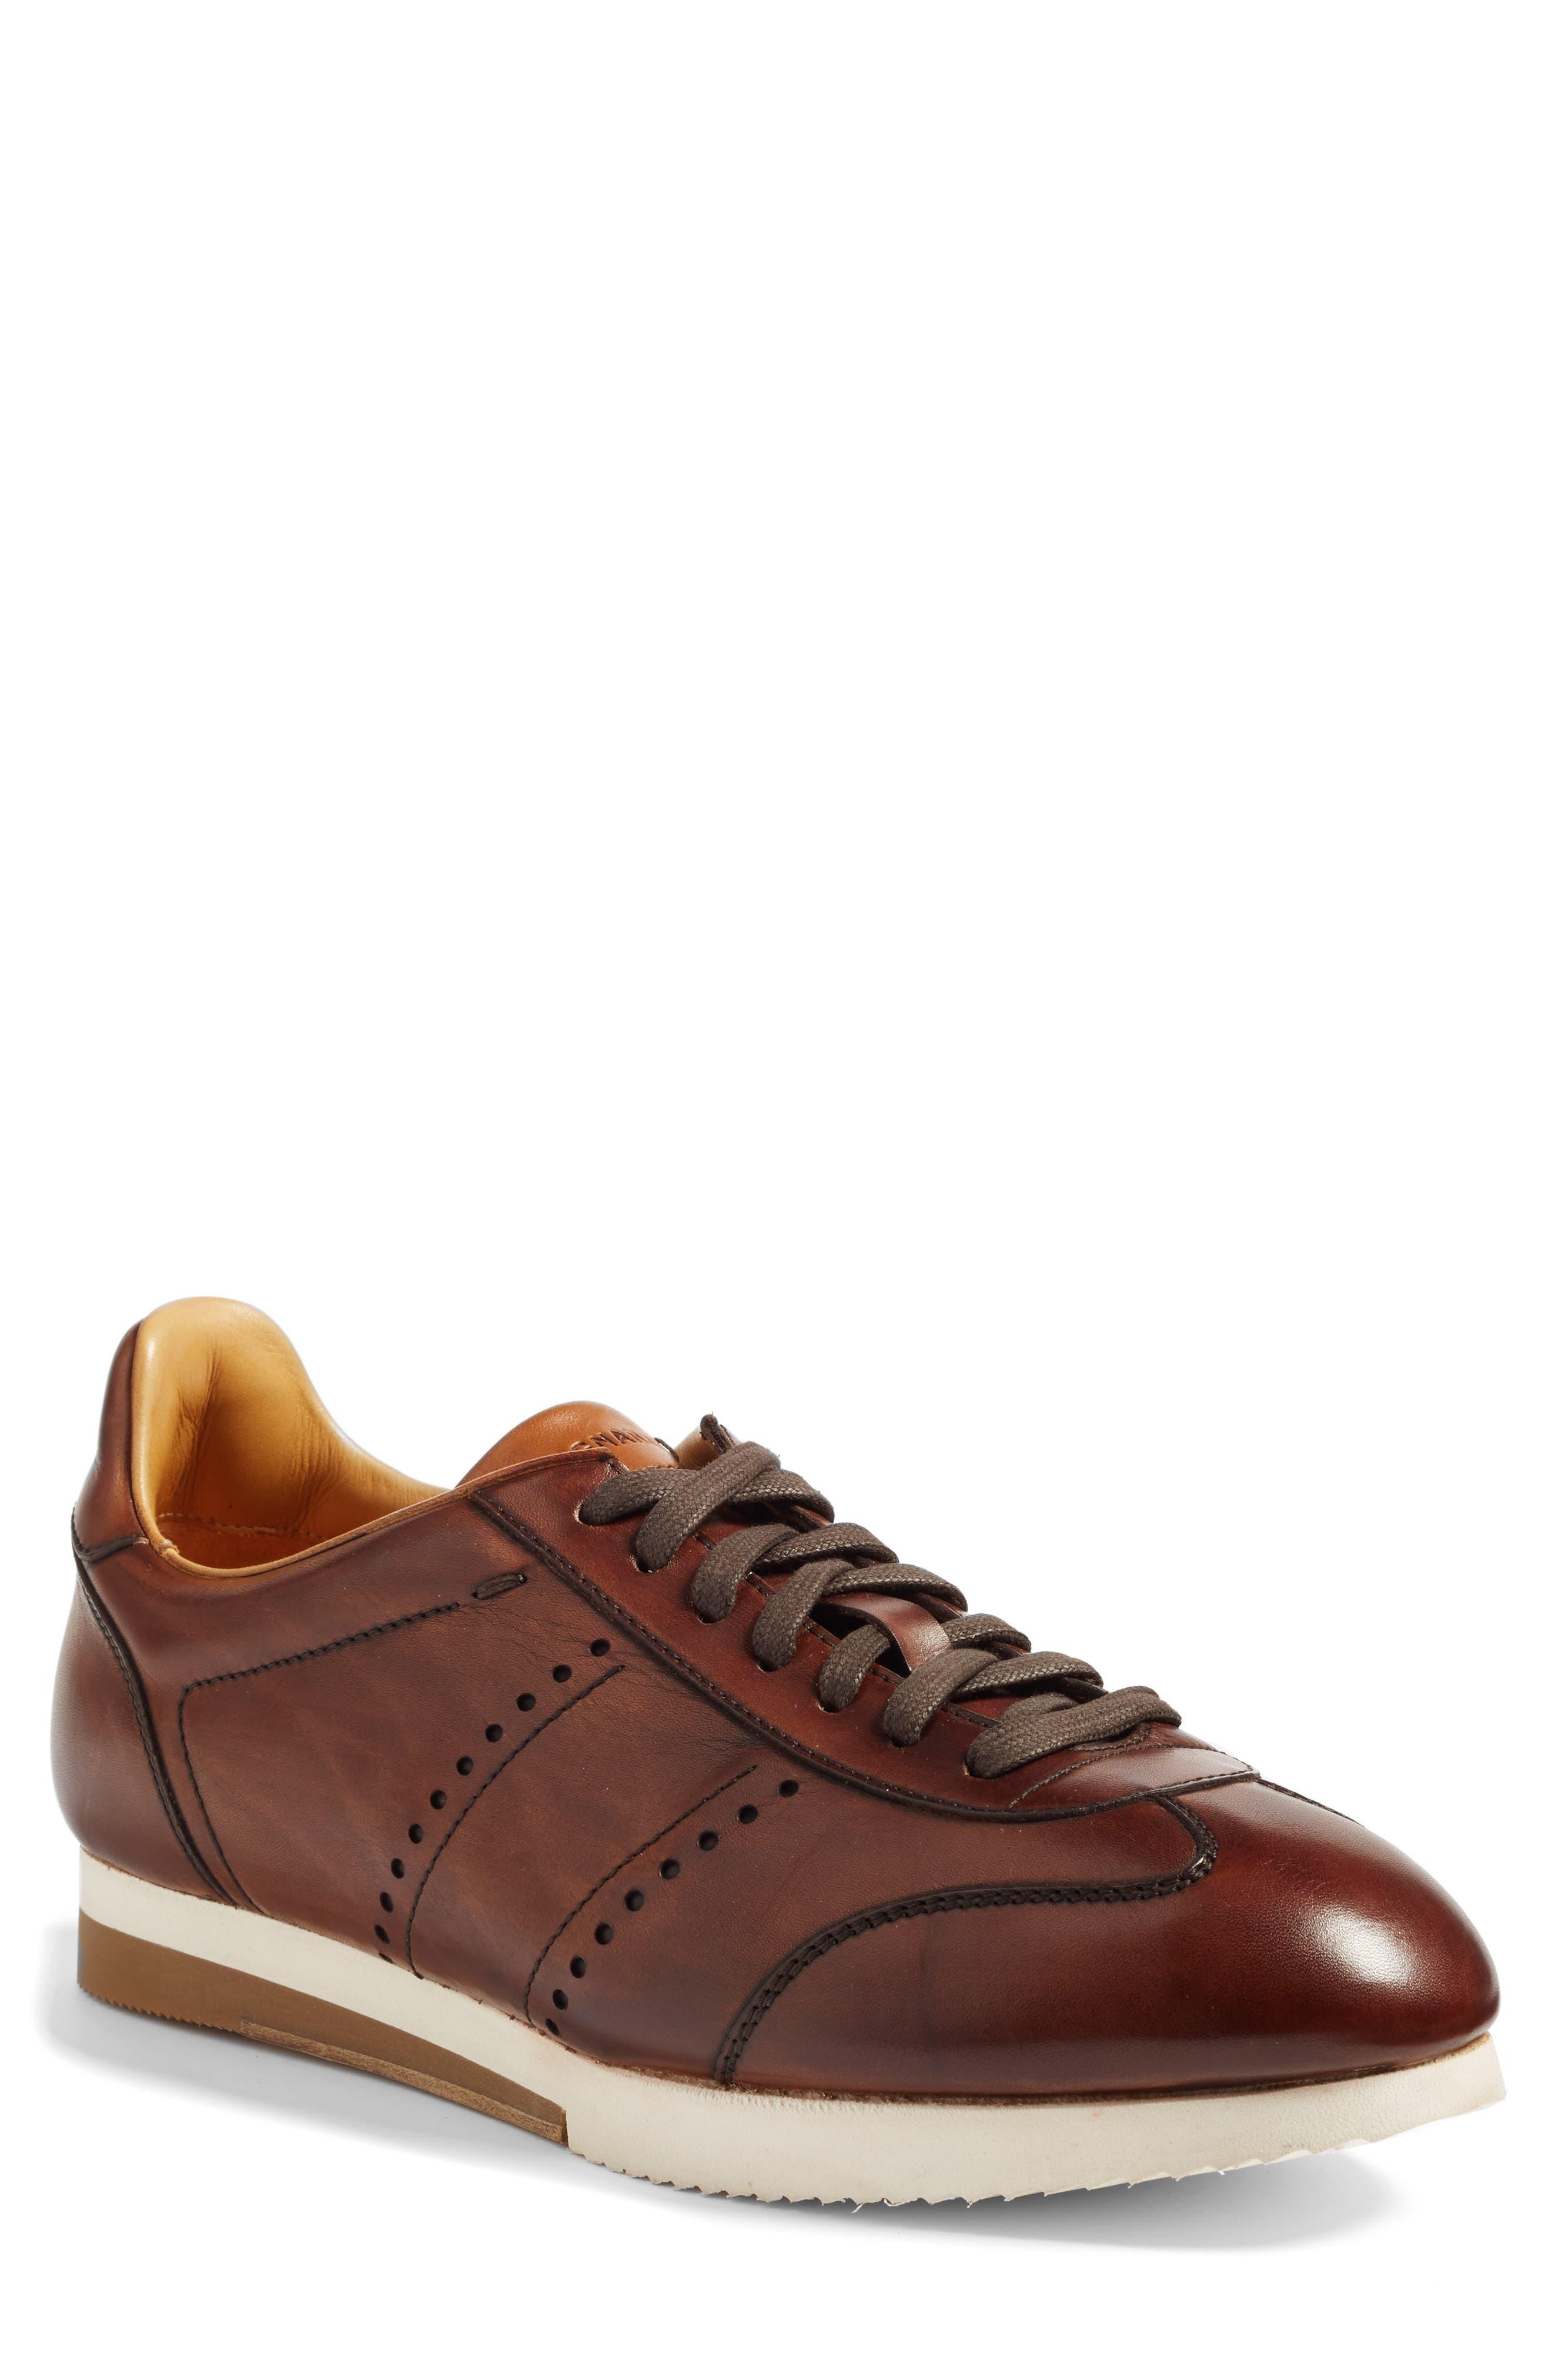 Main Image - Magnanni Isco Sneaker (Men)